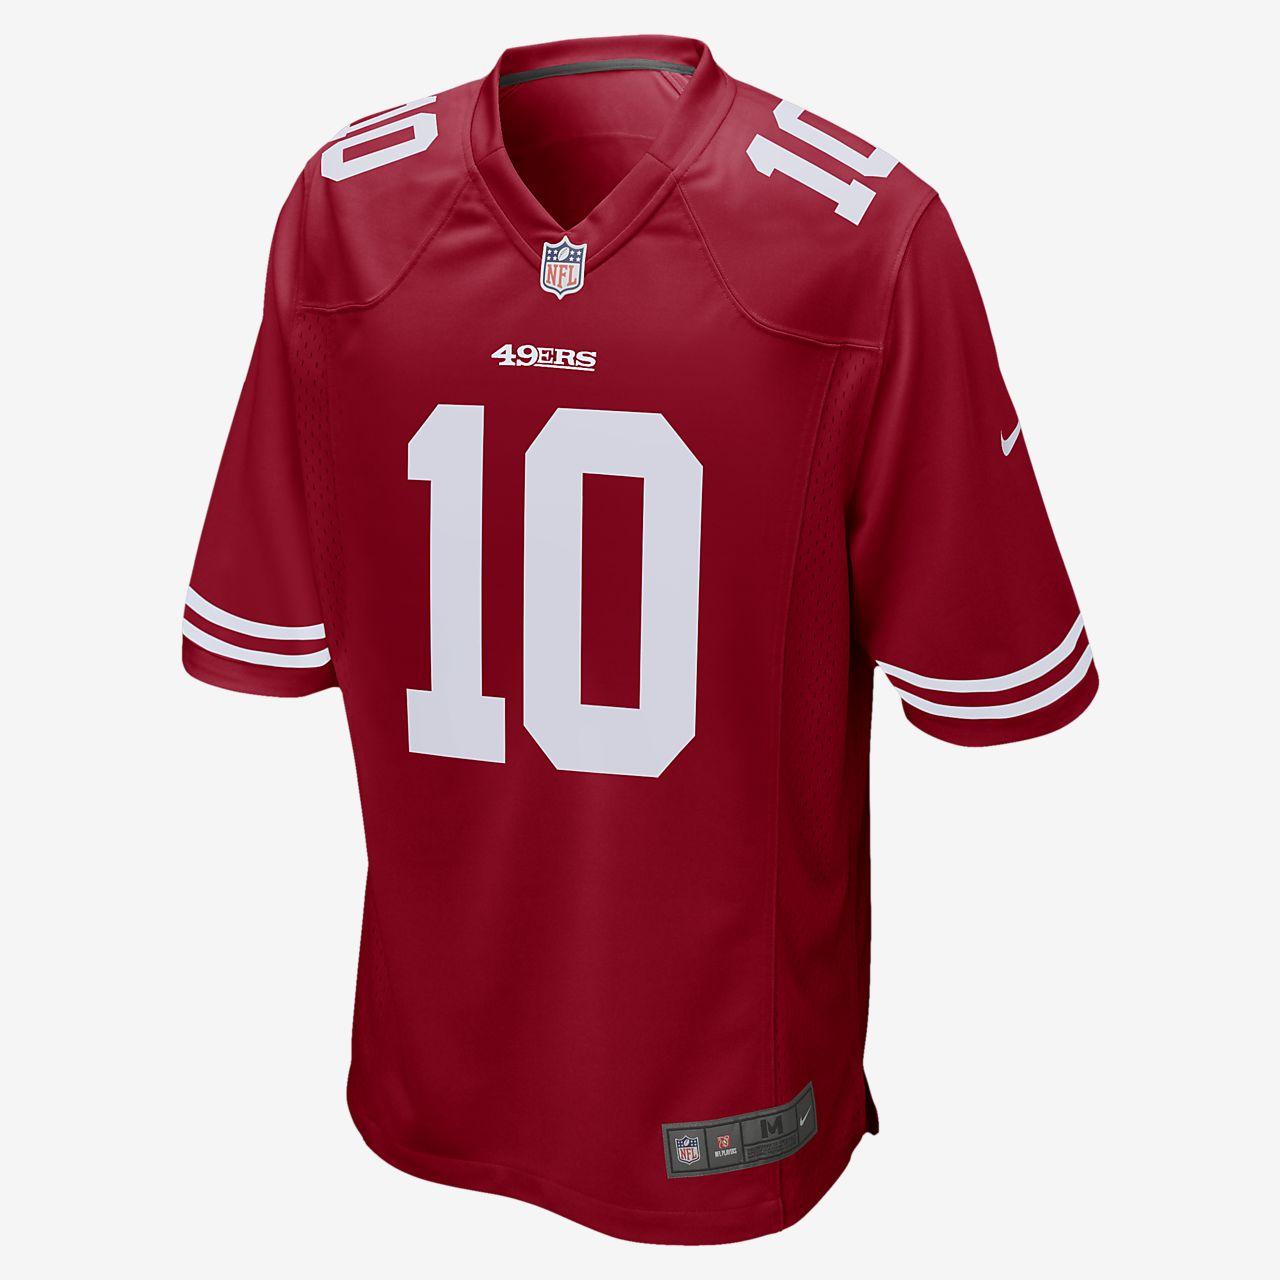 NFL San Francisco 49ers (Jimmy Garoppolo) American-Football-Trikot für Herren